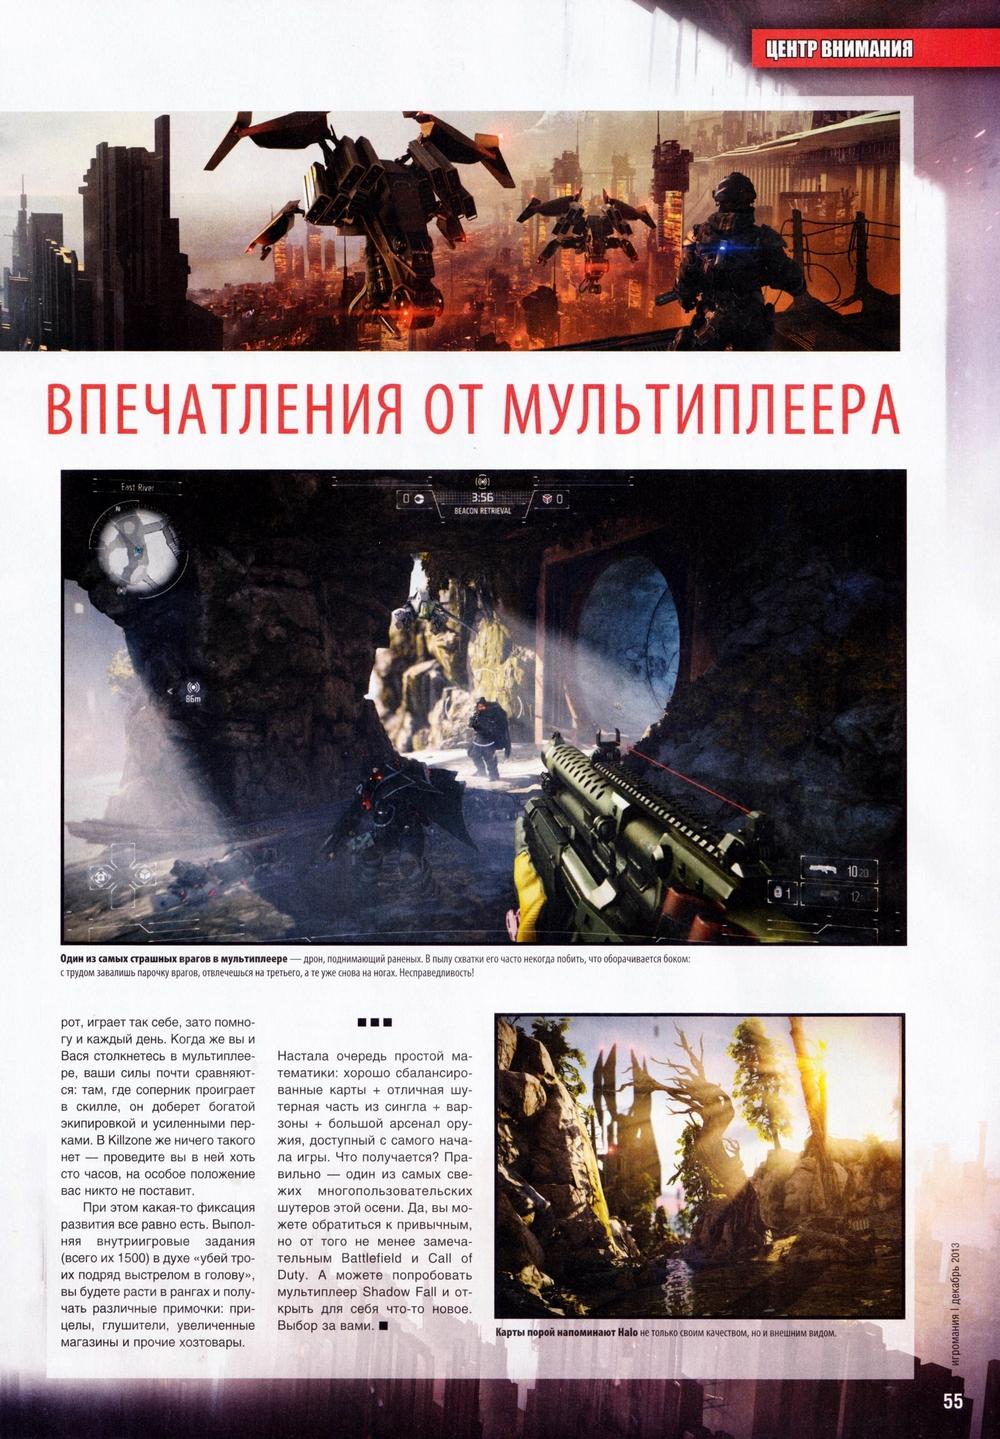 http://i6.imageban.ru/out/2013/11/27/6de8d38c36902afbd7cbcd5dd31c565b.jpg